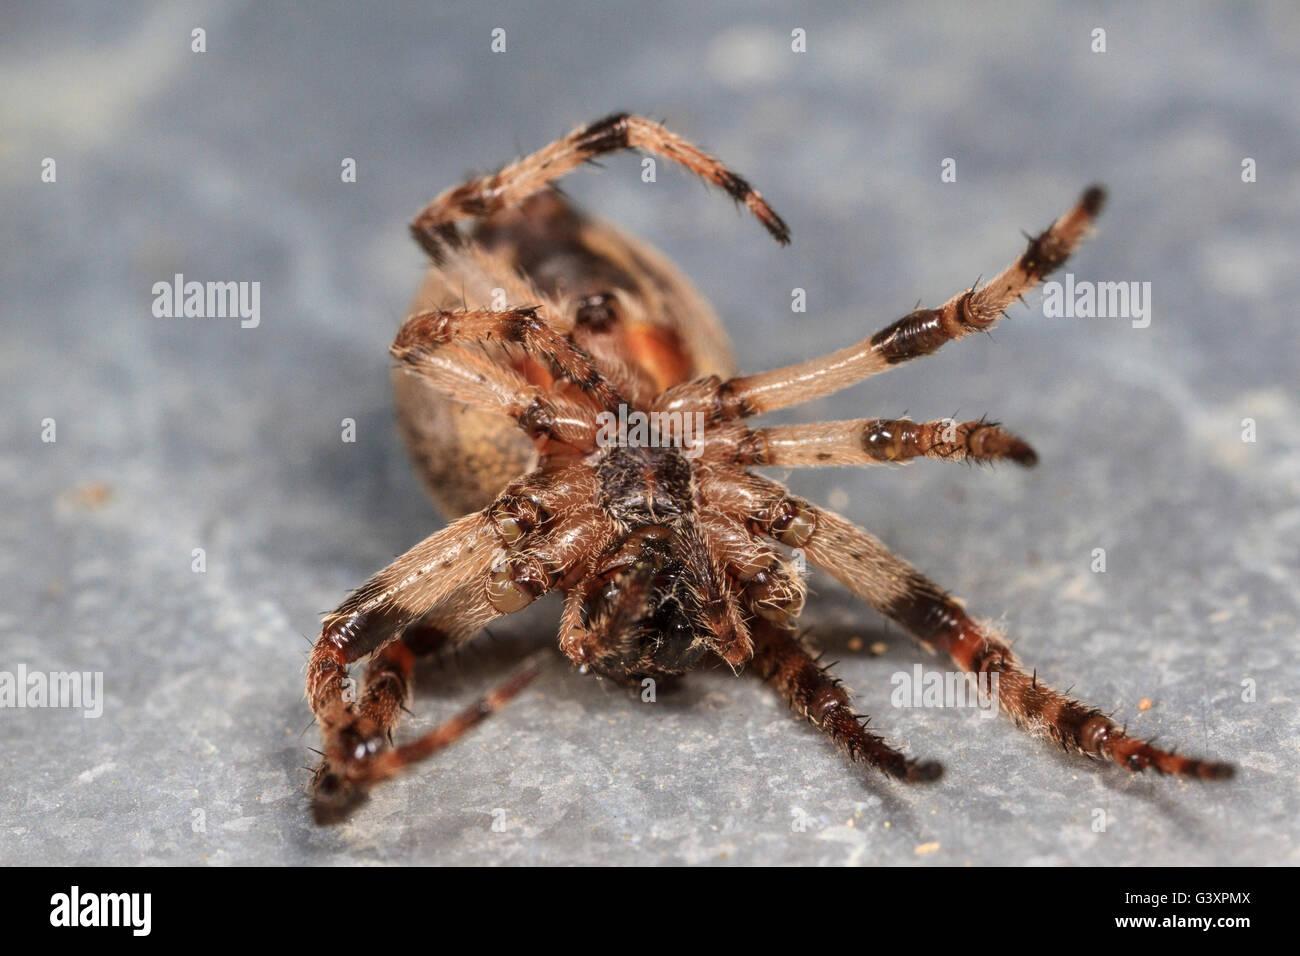 Dead orbweaver spider. Stock Photo